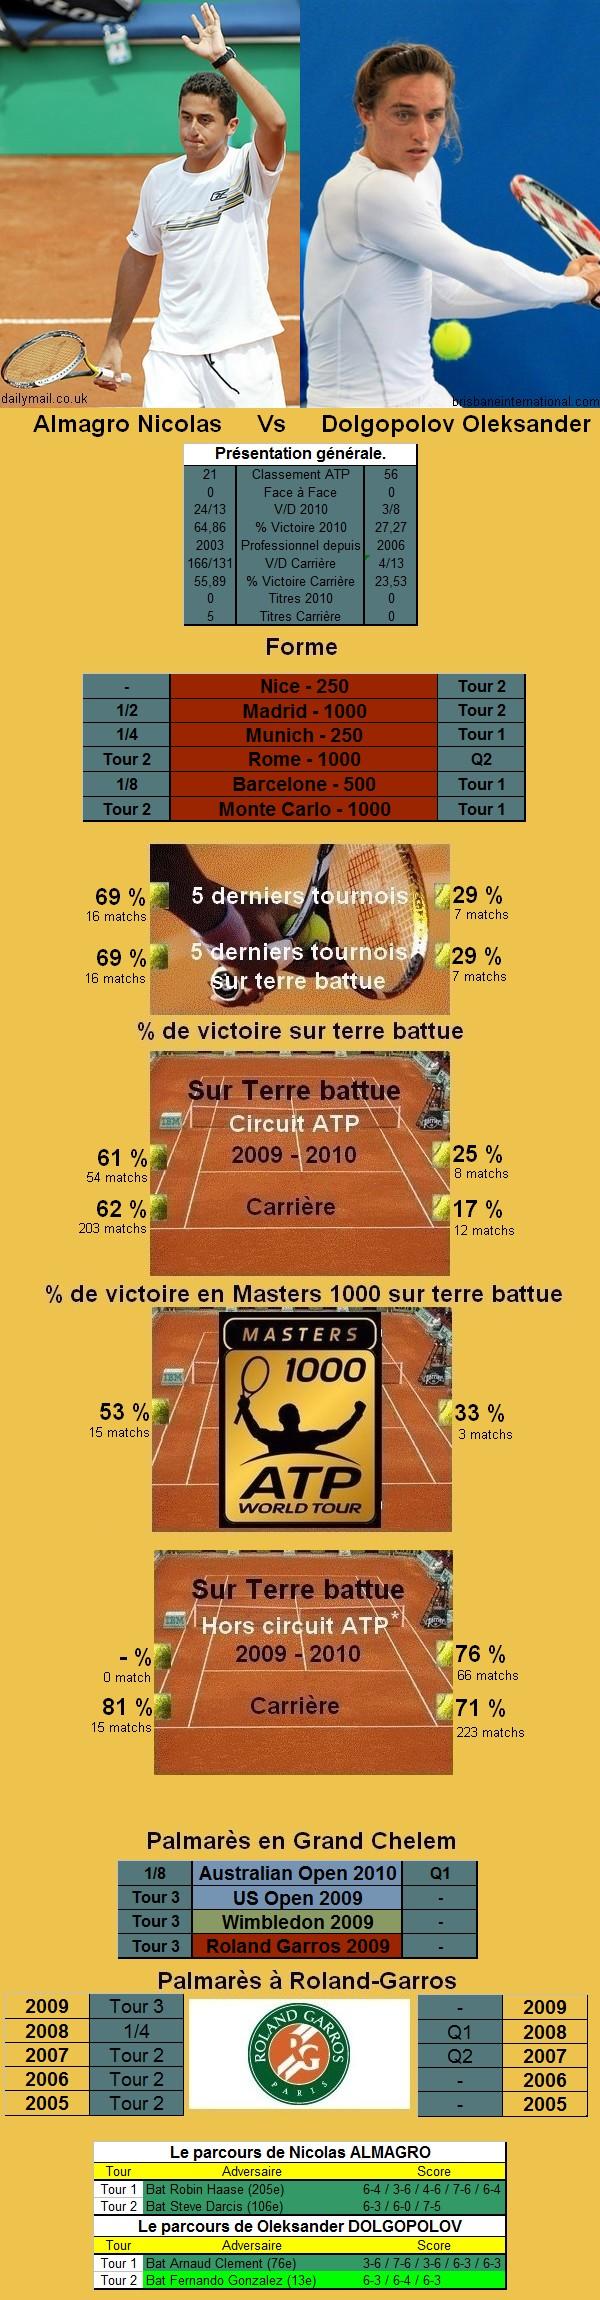 Statistiques tennis de Almagro contre Dolgopolov à Roland Garros